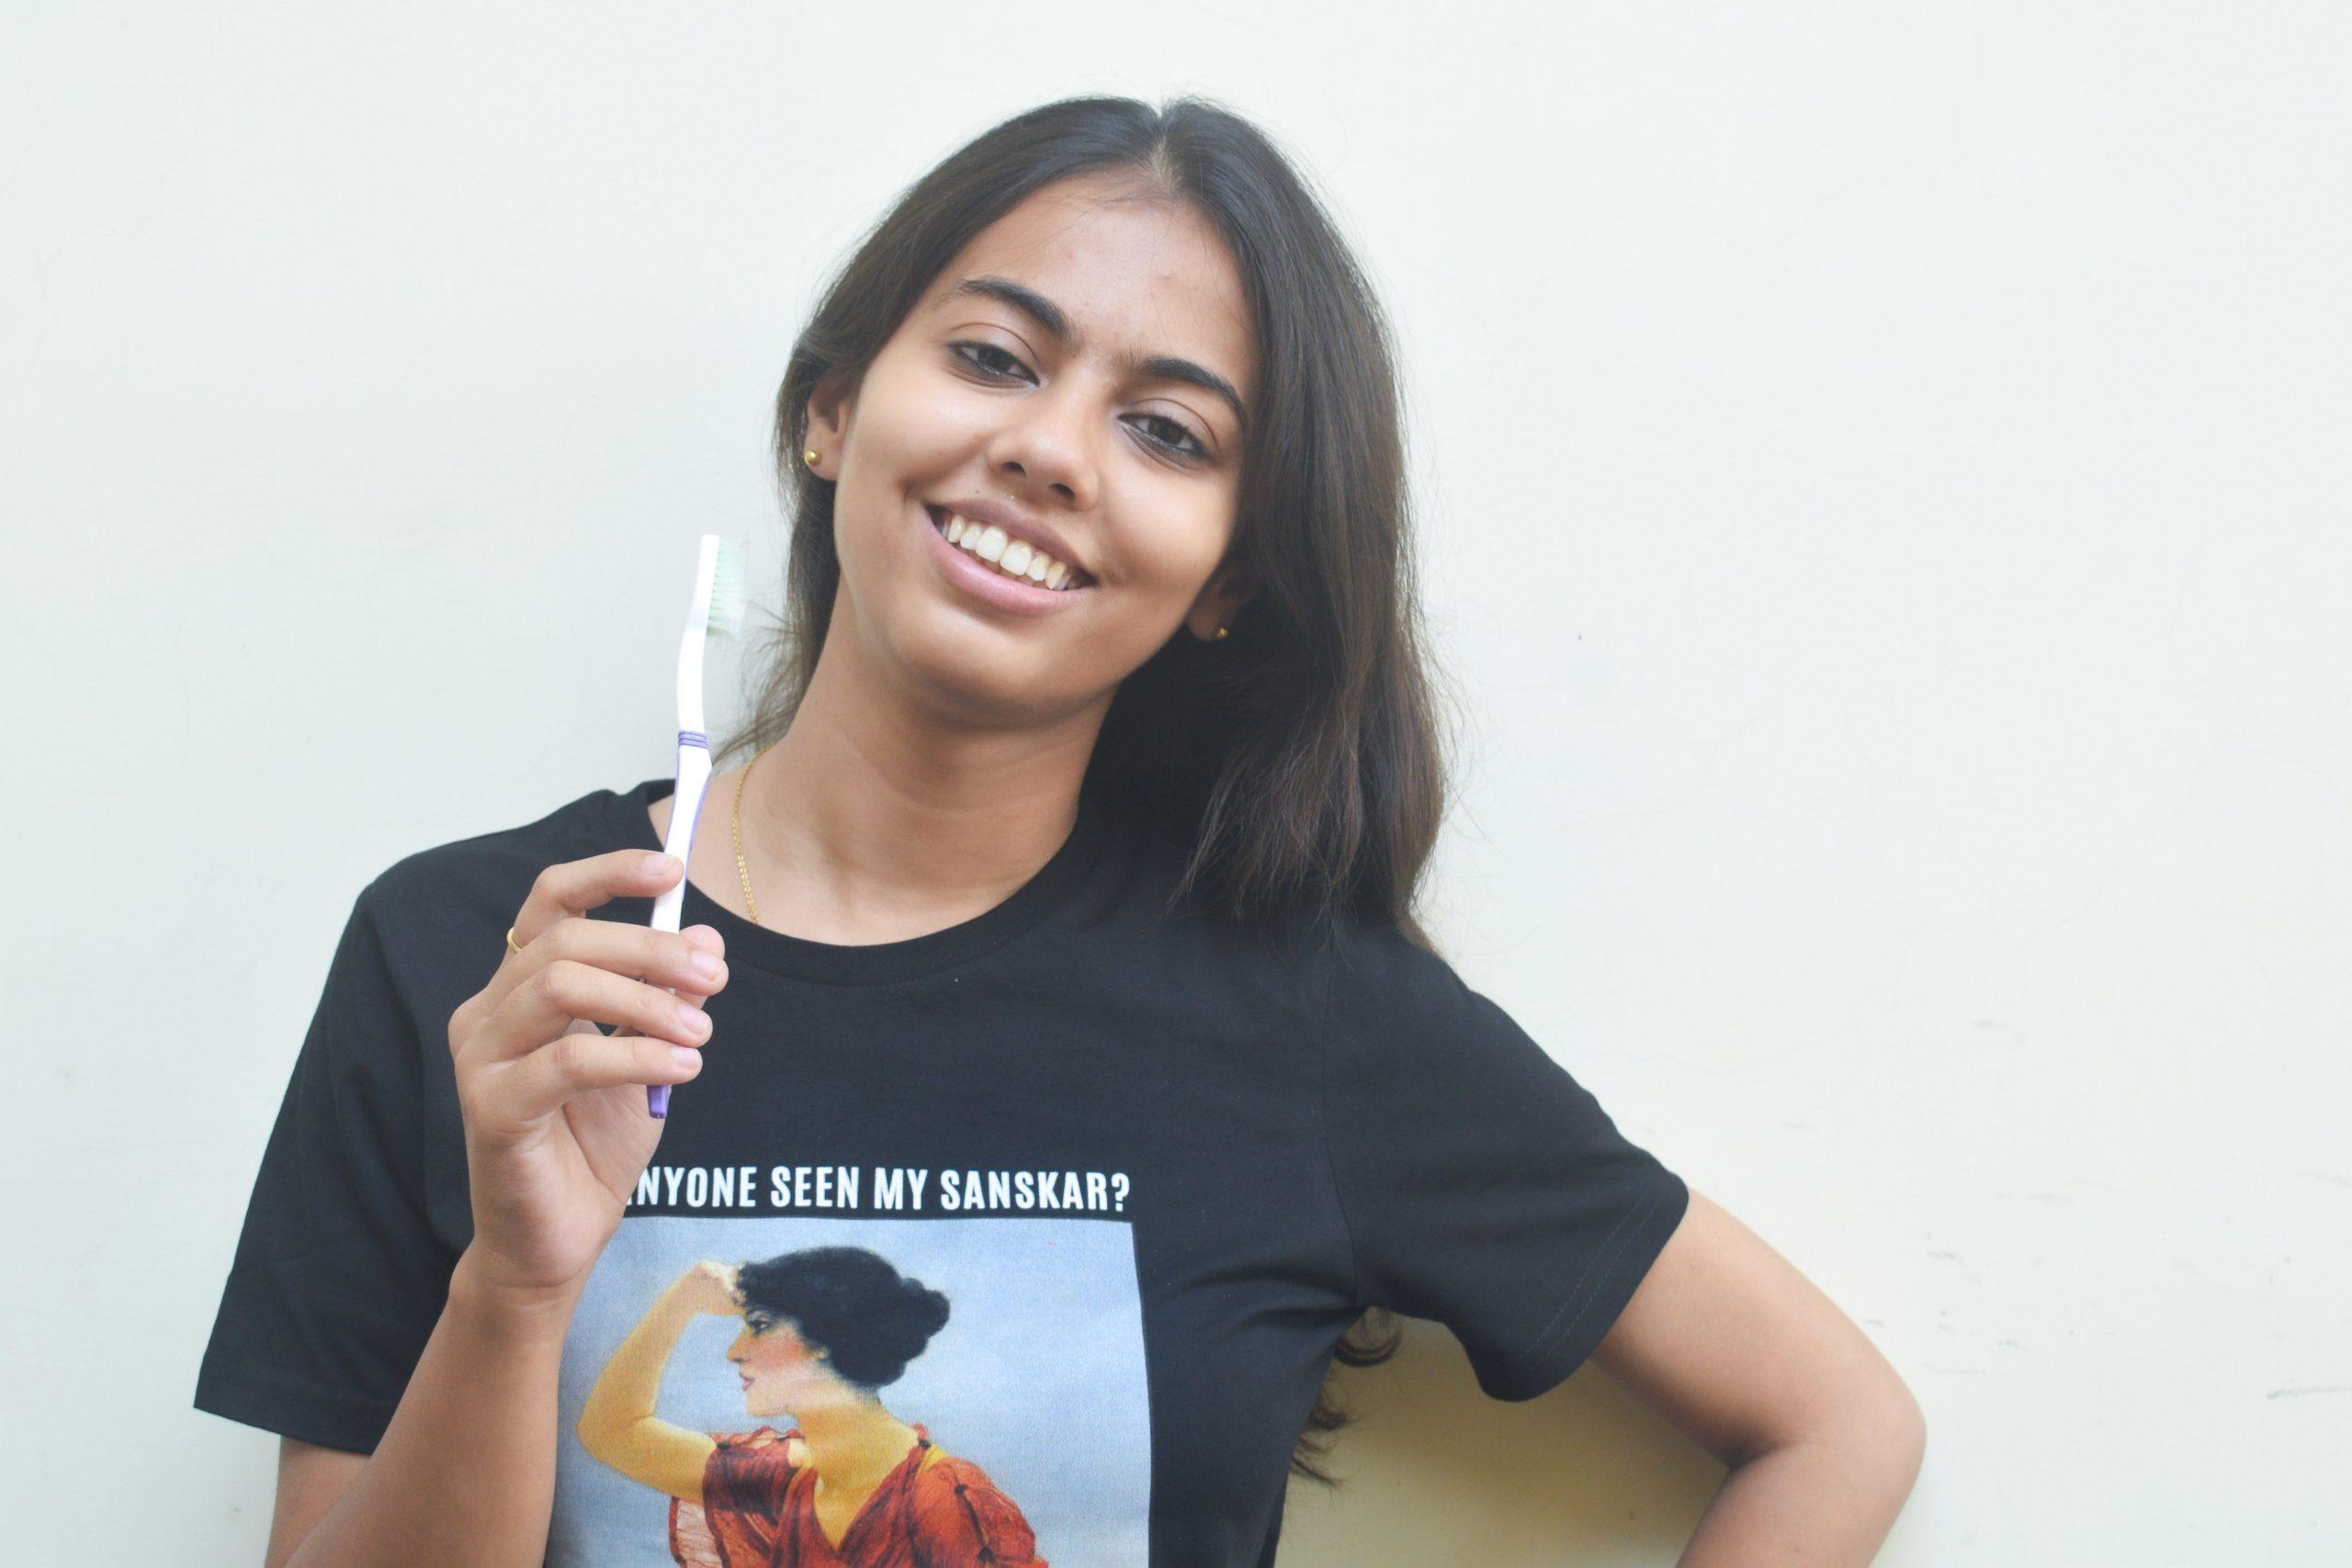 girl holding toothbrush